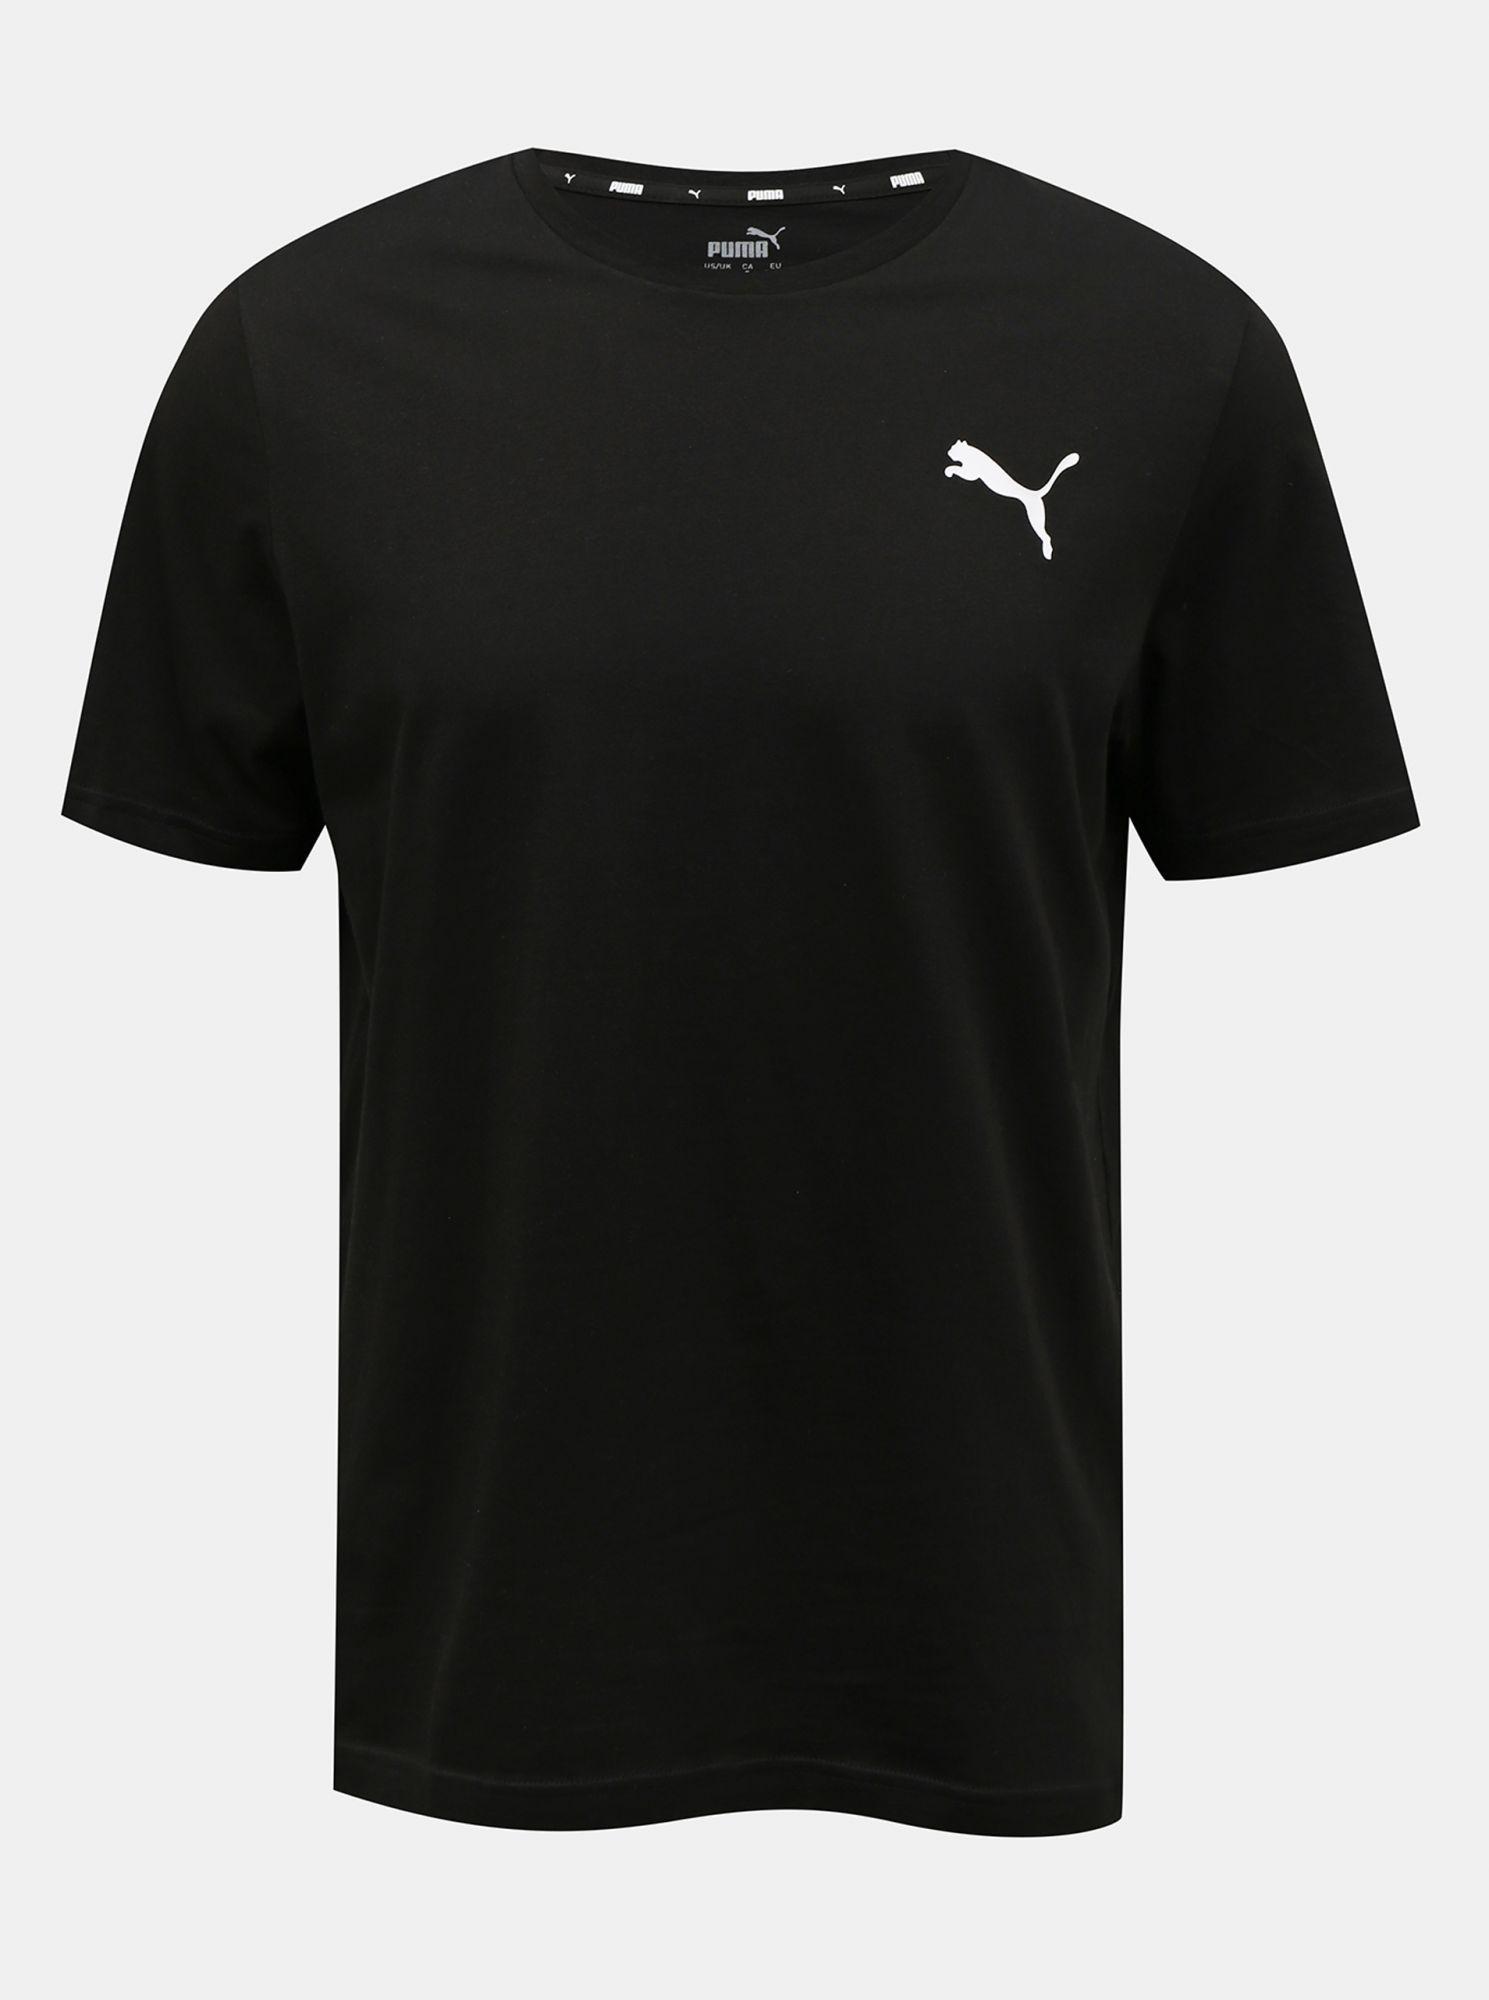 Puma černé pánské tričko s logem